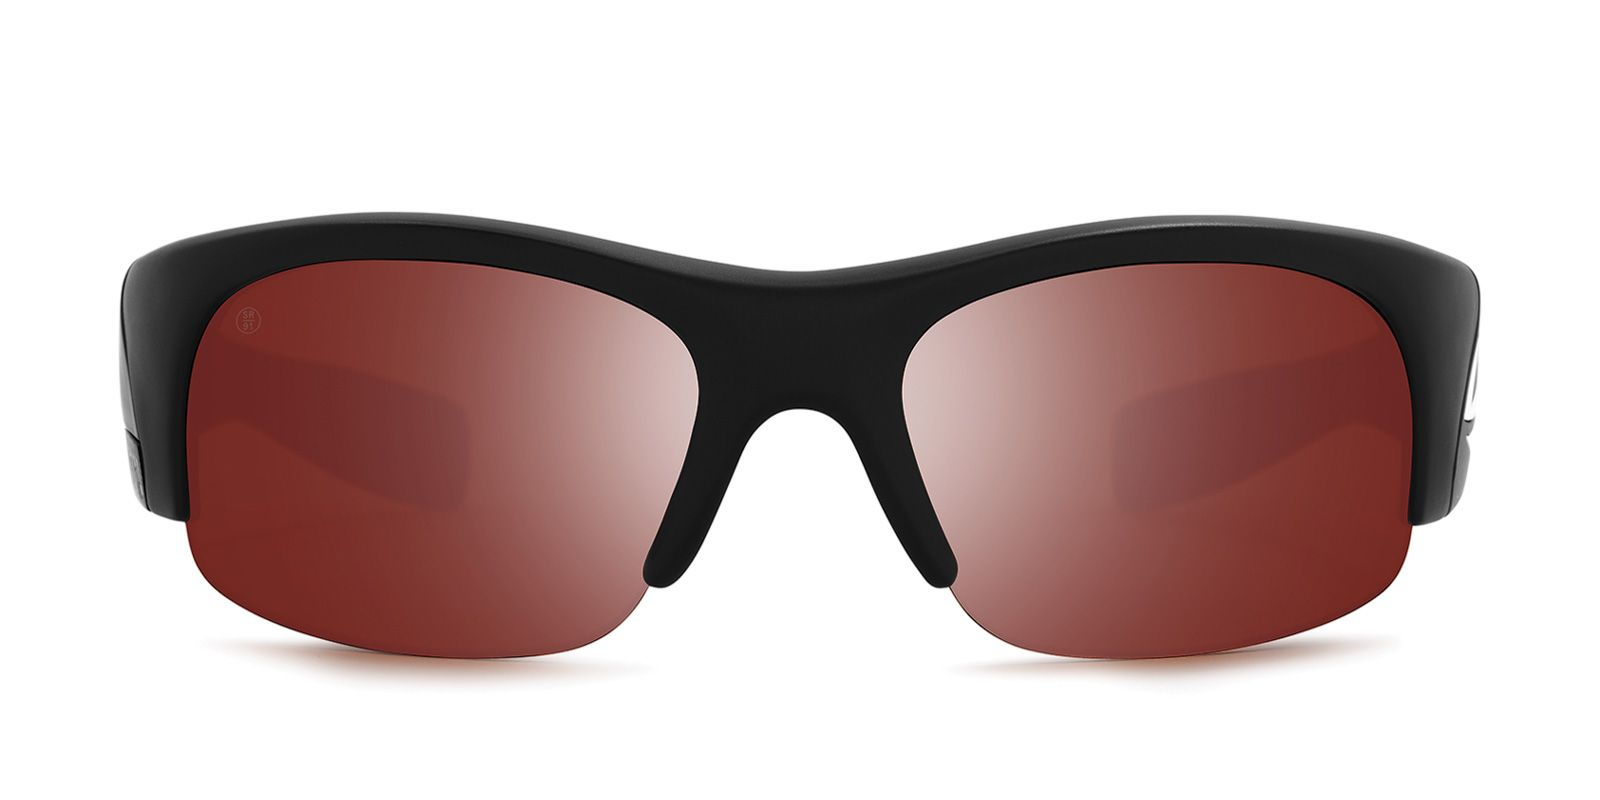 37b5e3ee6c Kaenon - Kaenon Hard Kore Matte Black White (C12 Copper-Silver Mirror)  Polarized Plastic Sunglasses 63mm - Walmart.com